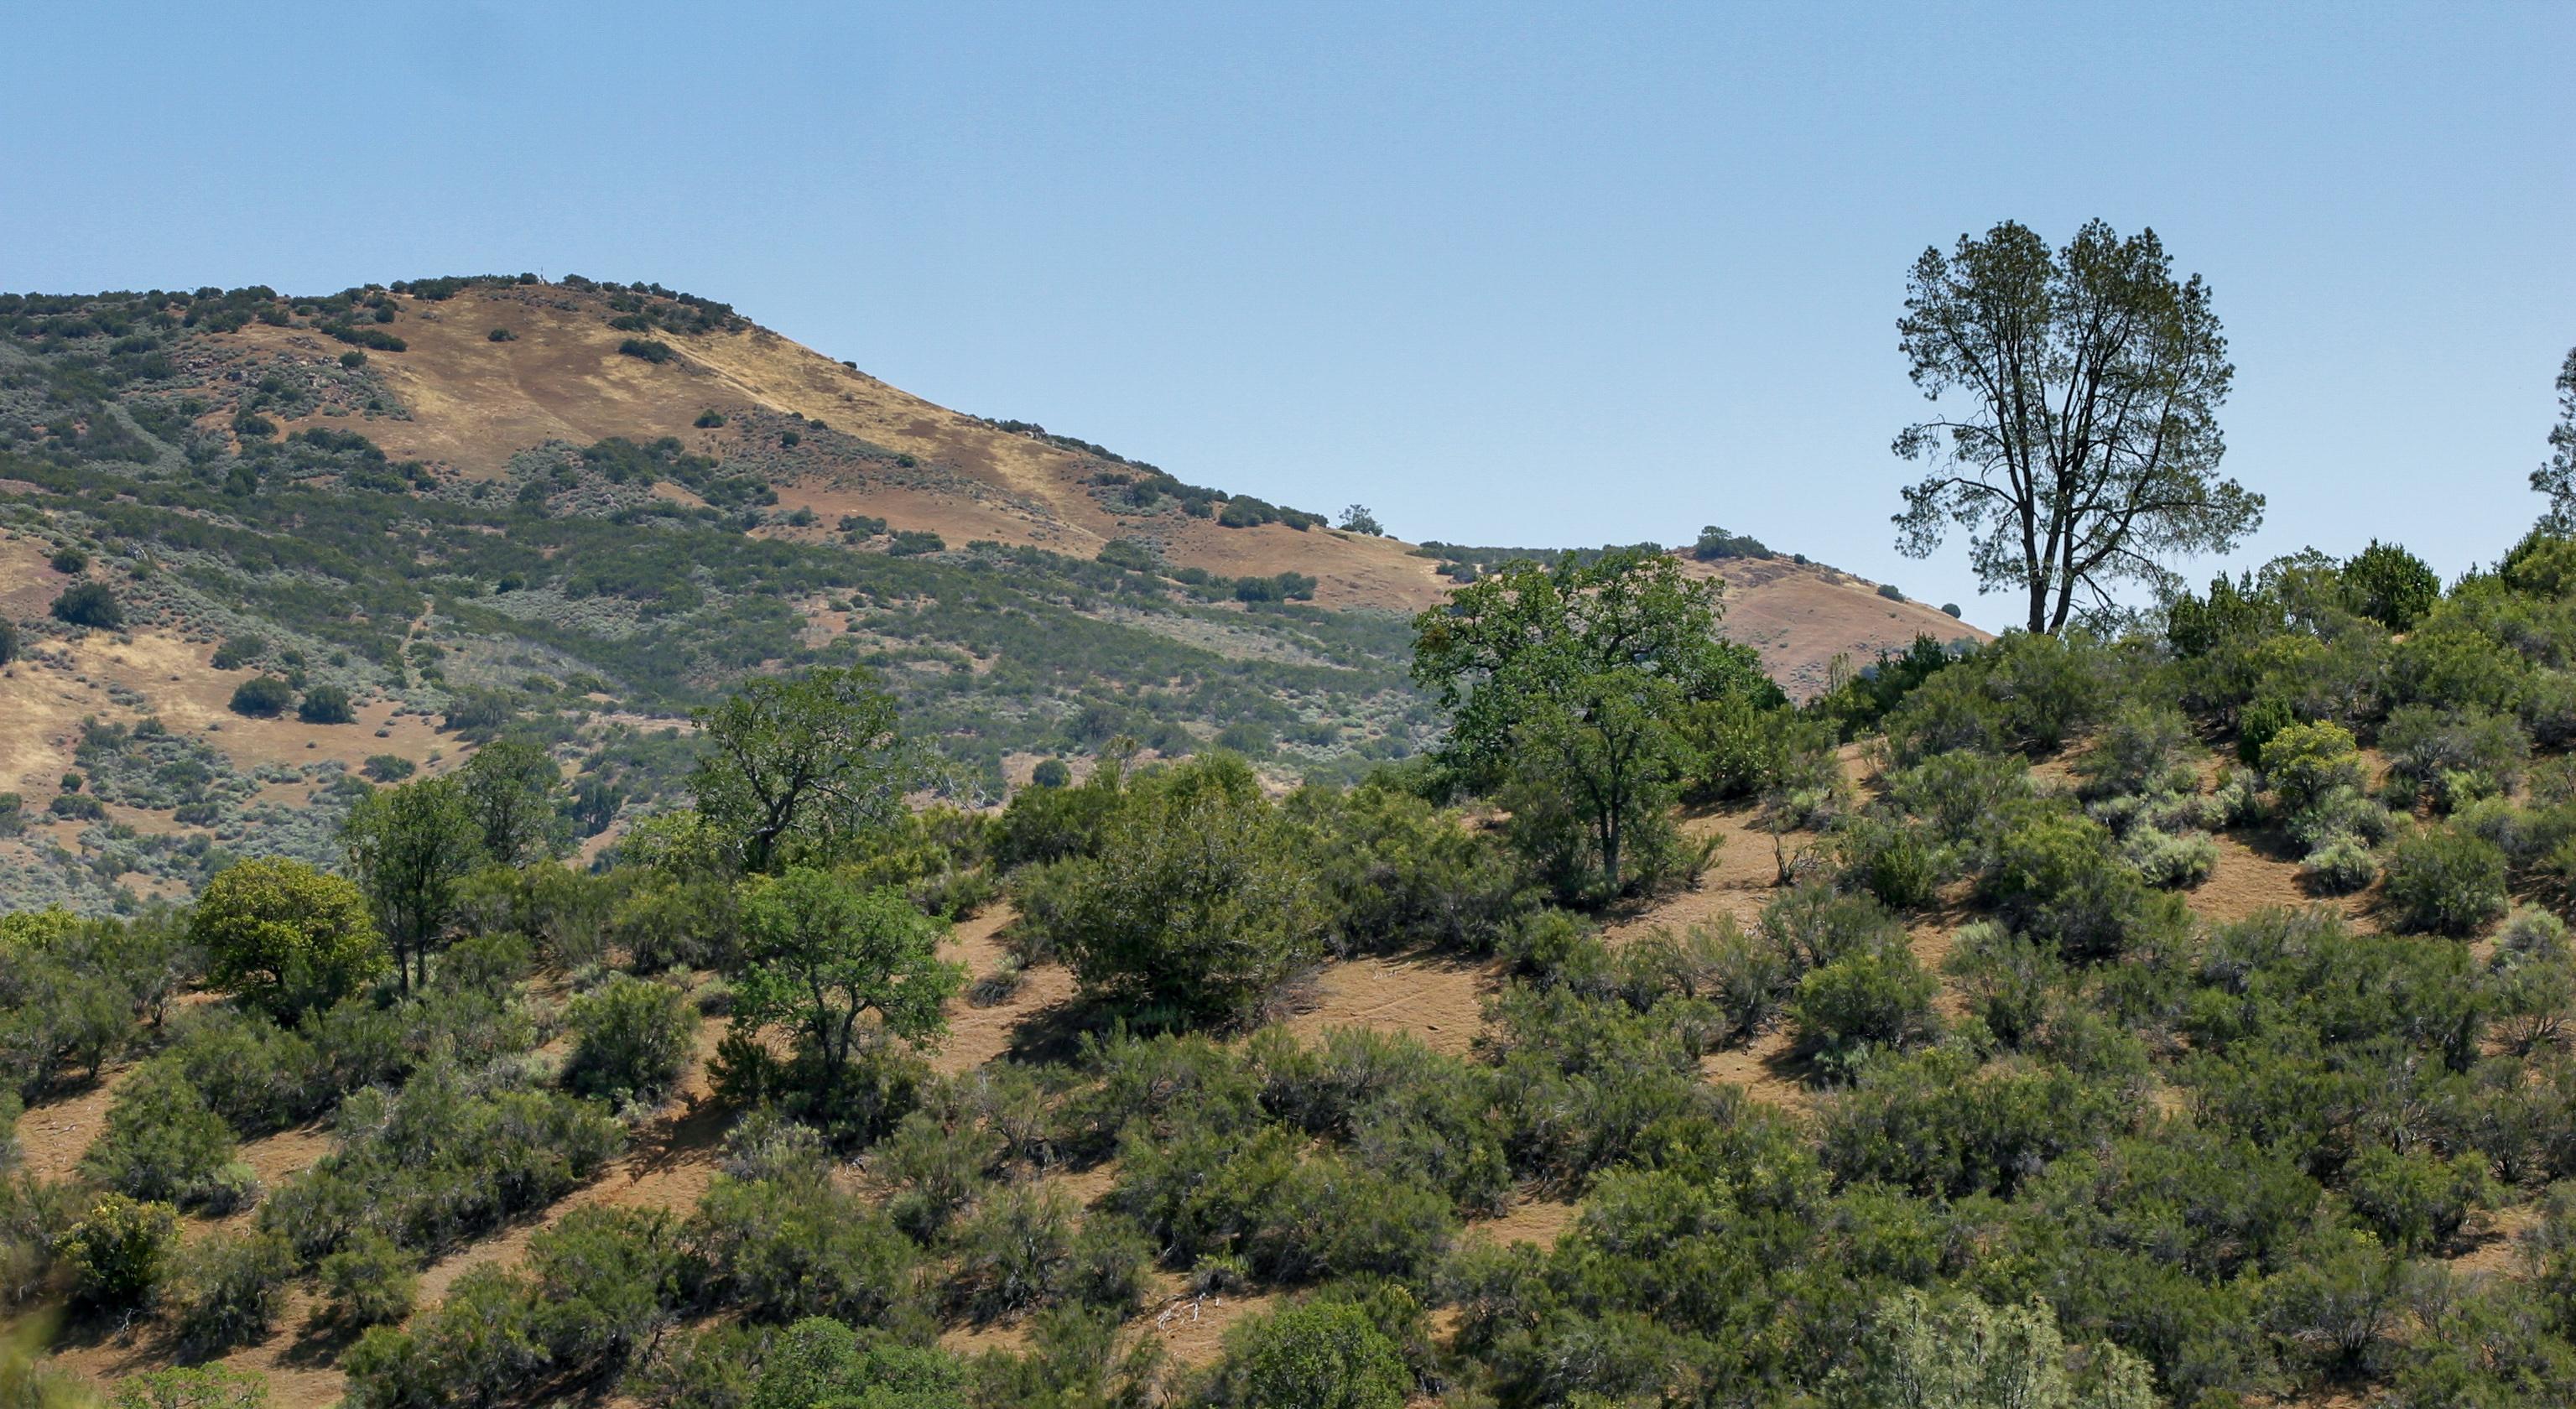 Environmental groups sue to block new California dam project